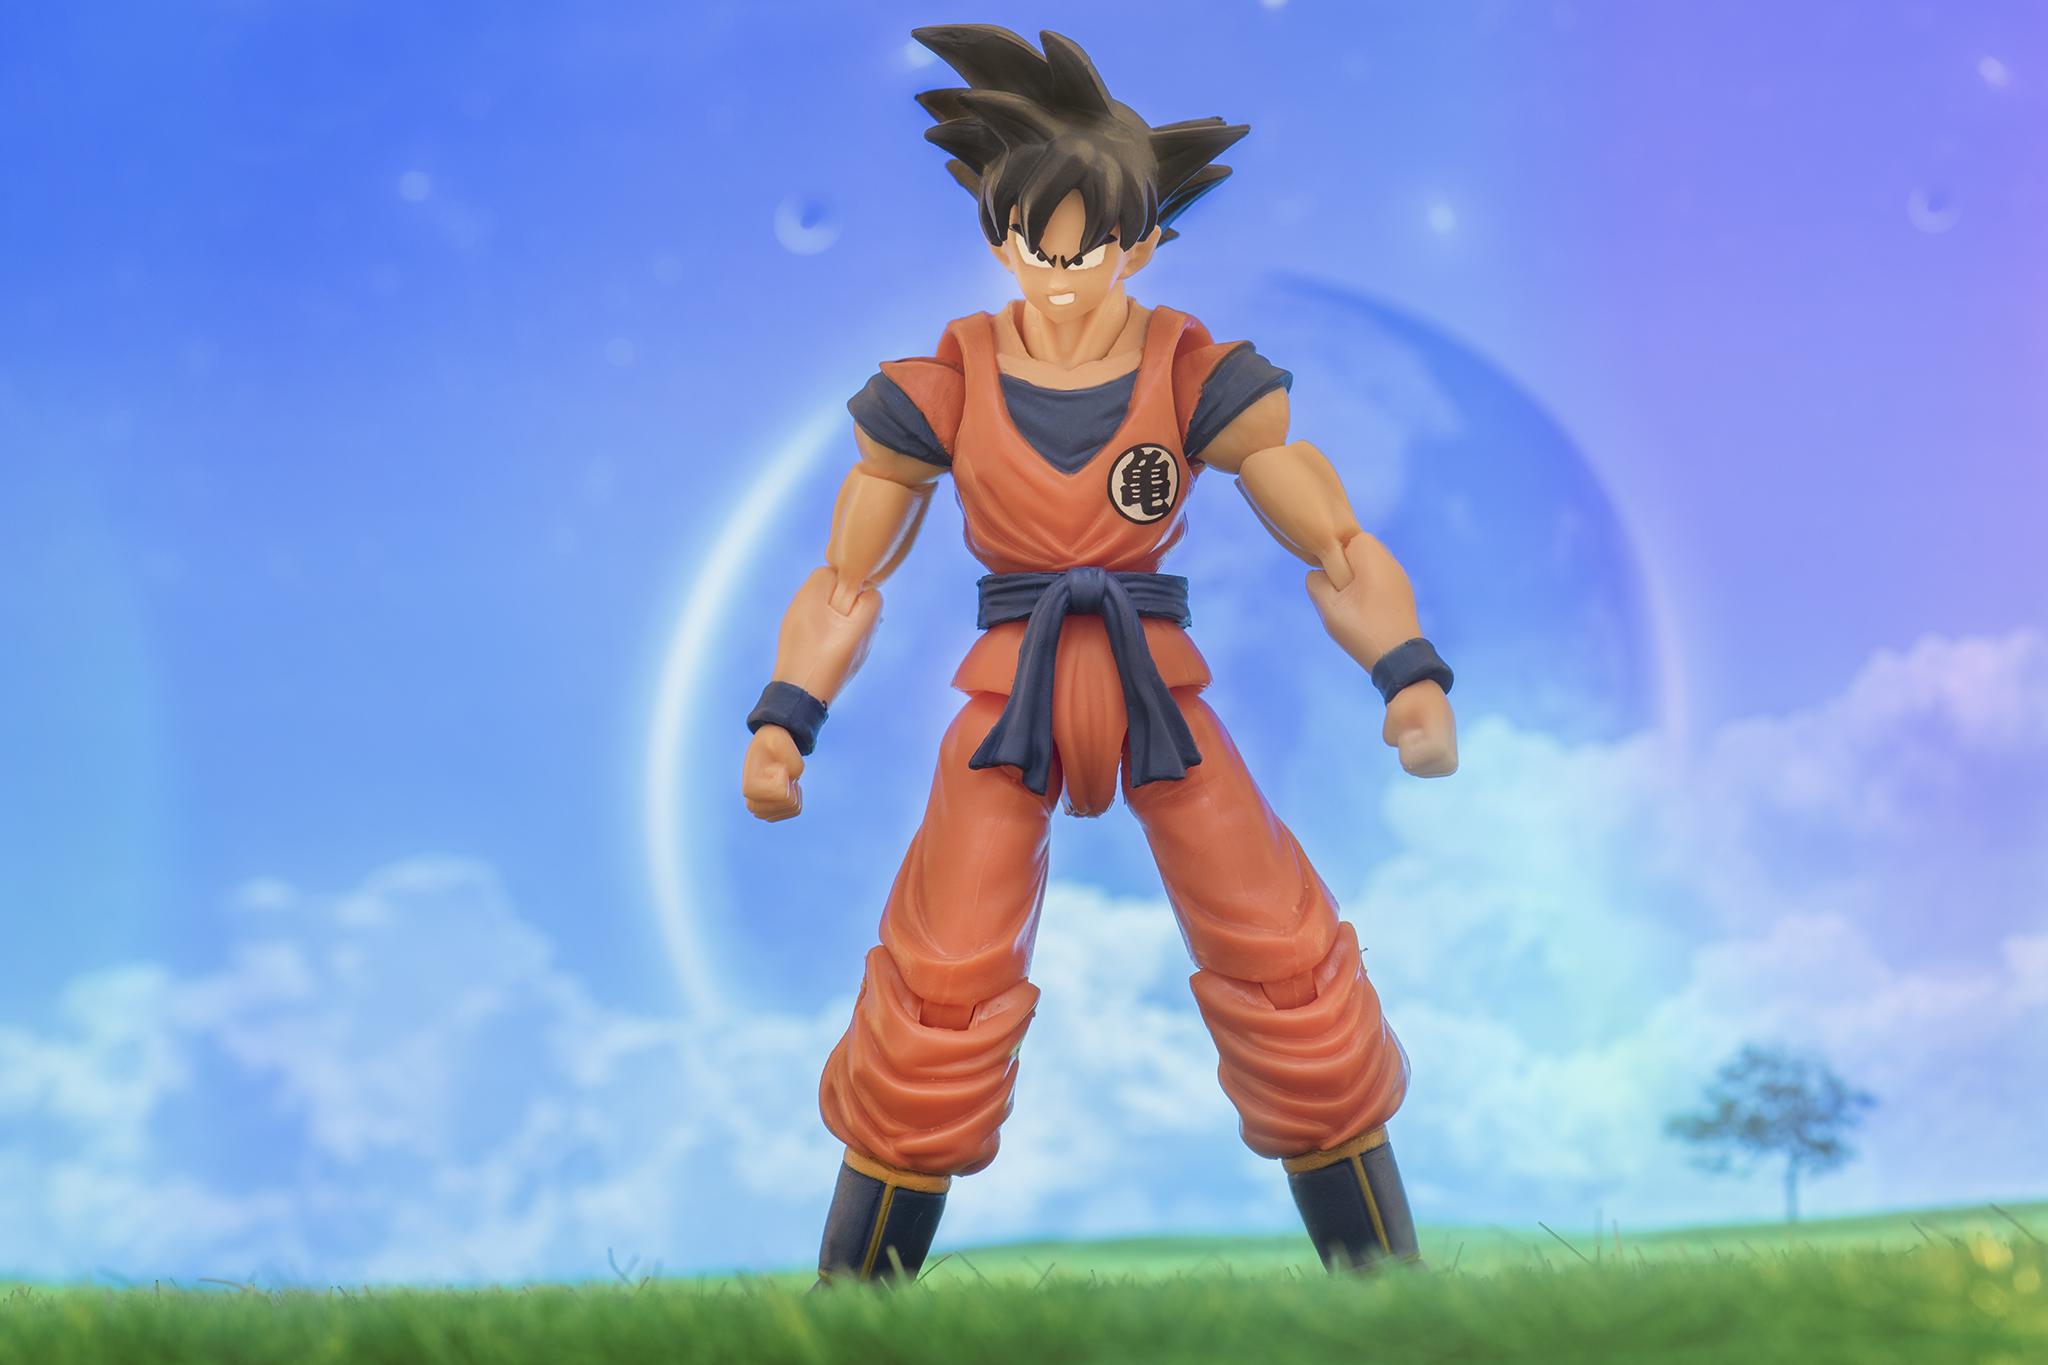 Goku waiting for the next battle